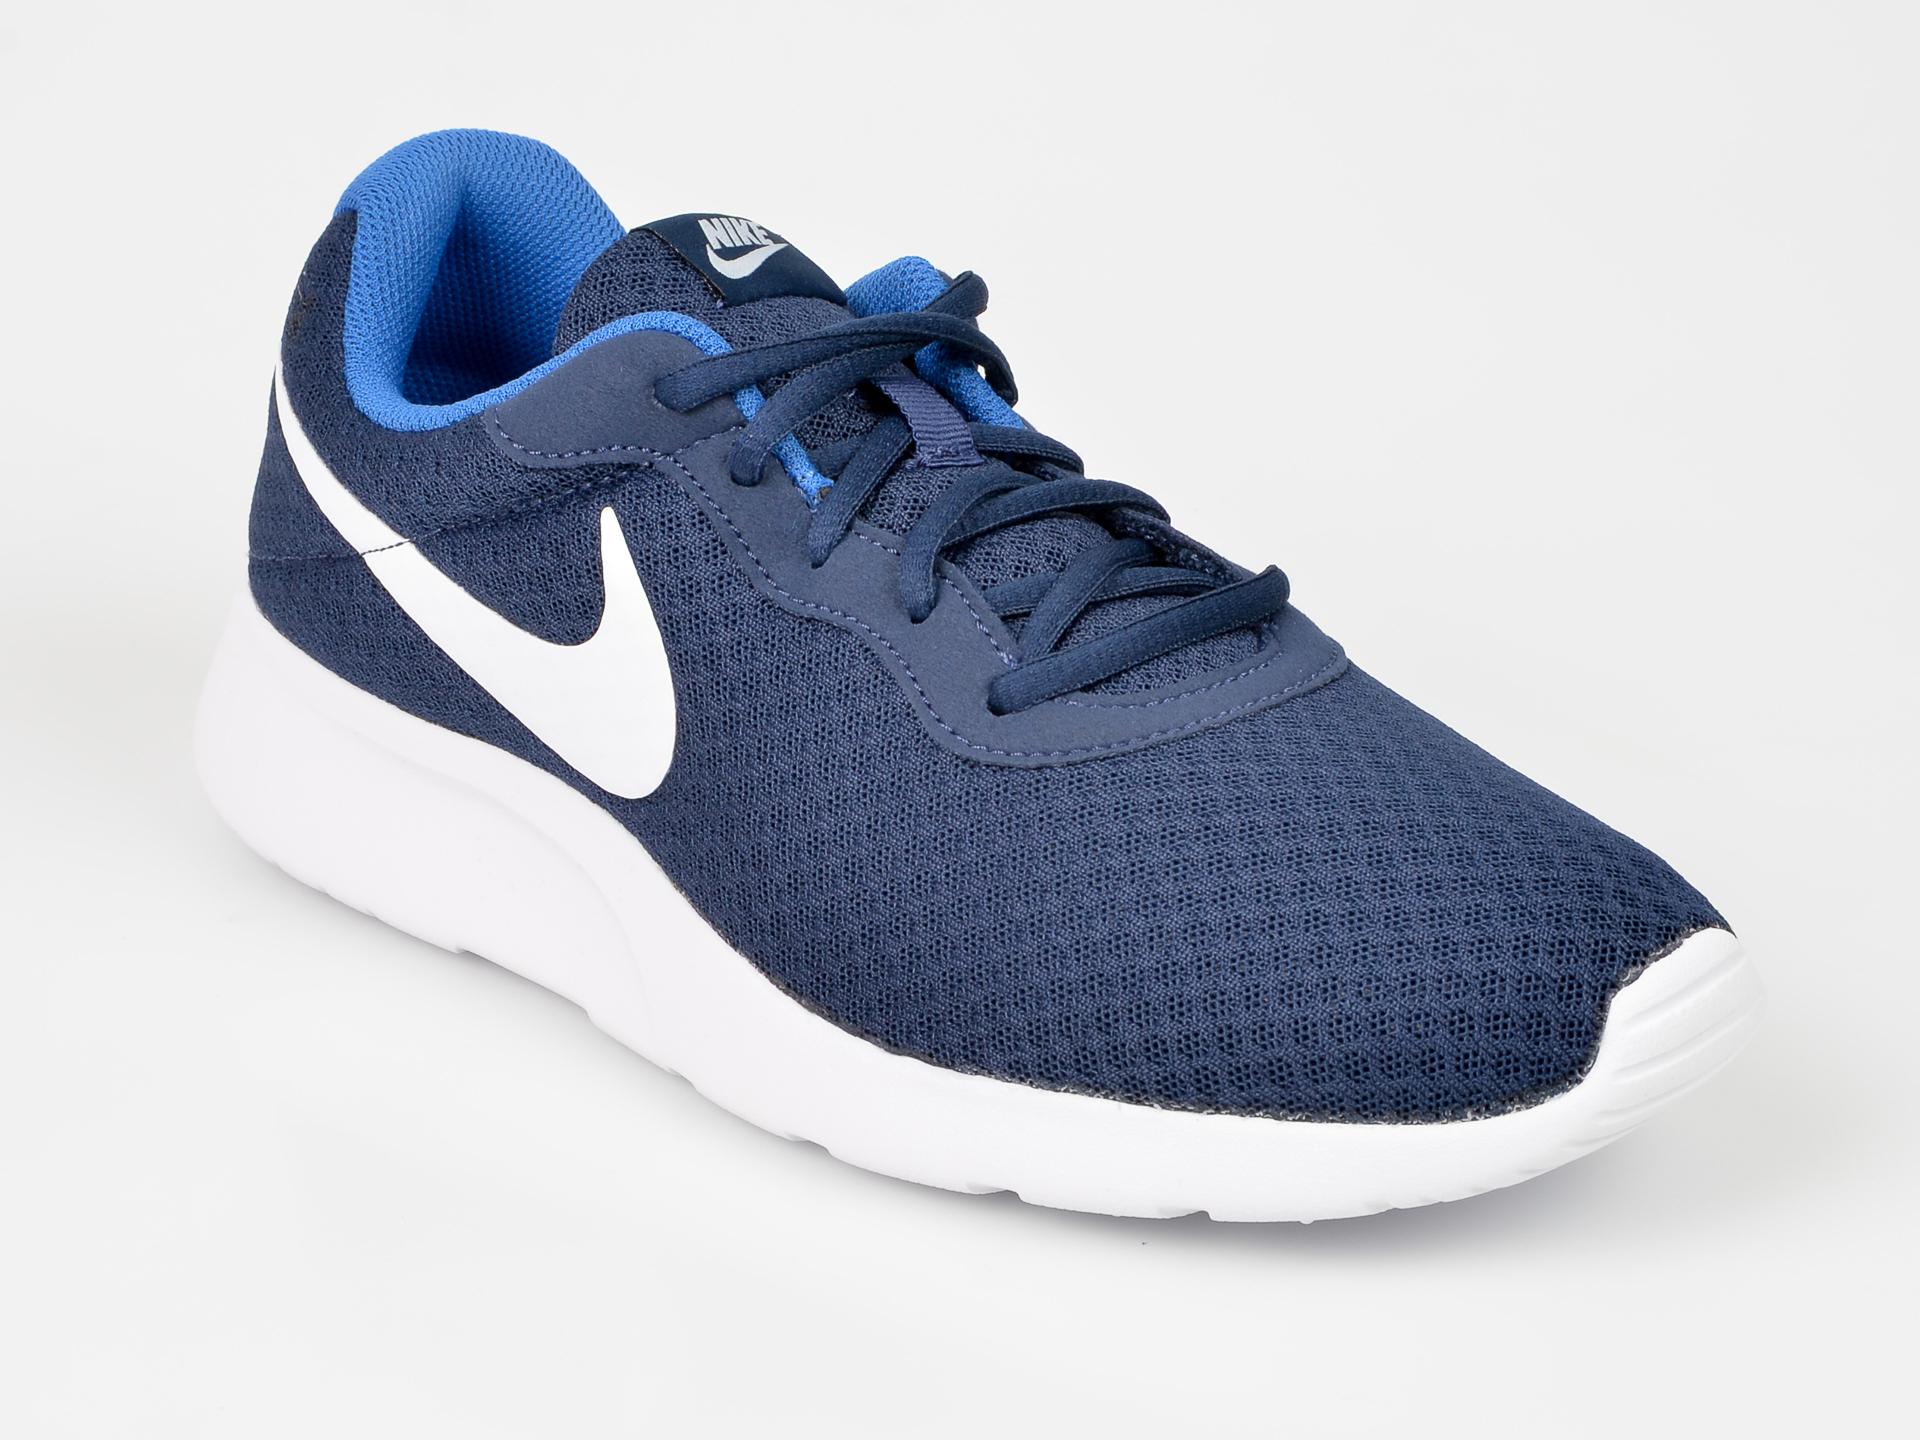 Pantofi sport NIKE bleumarin, 812654, din piele ecologica